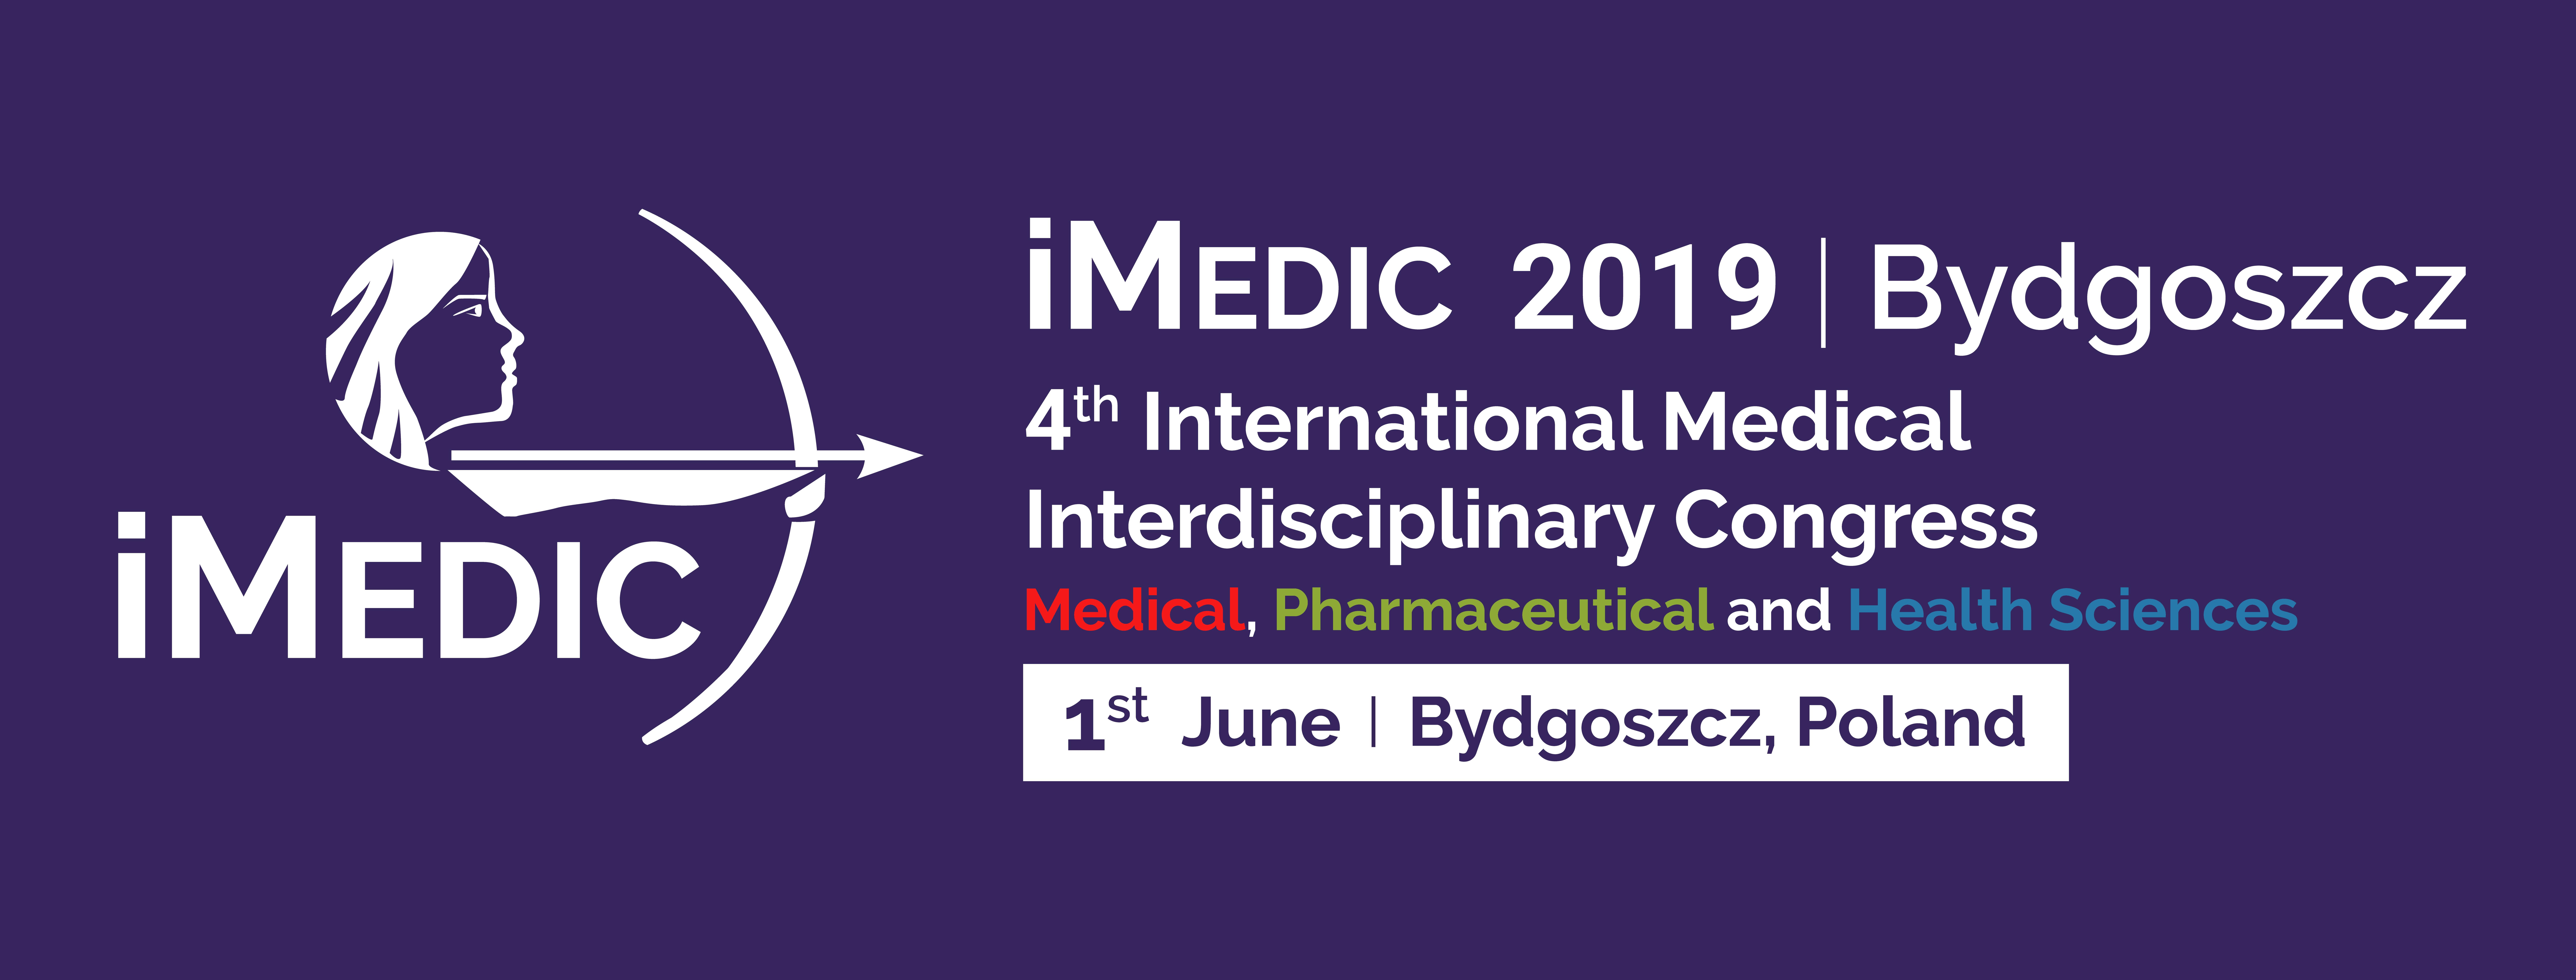 IV International Medical Interdyscyplinary Congress – iMEDIC